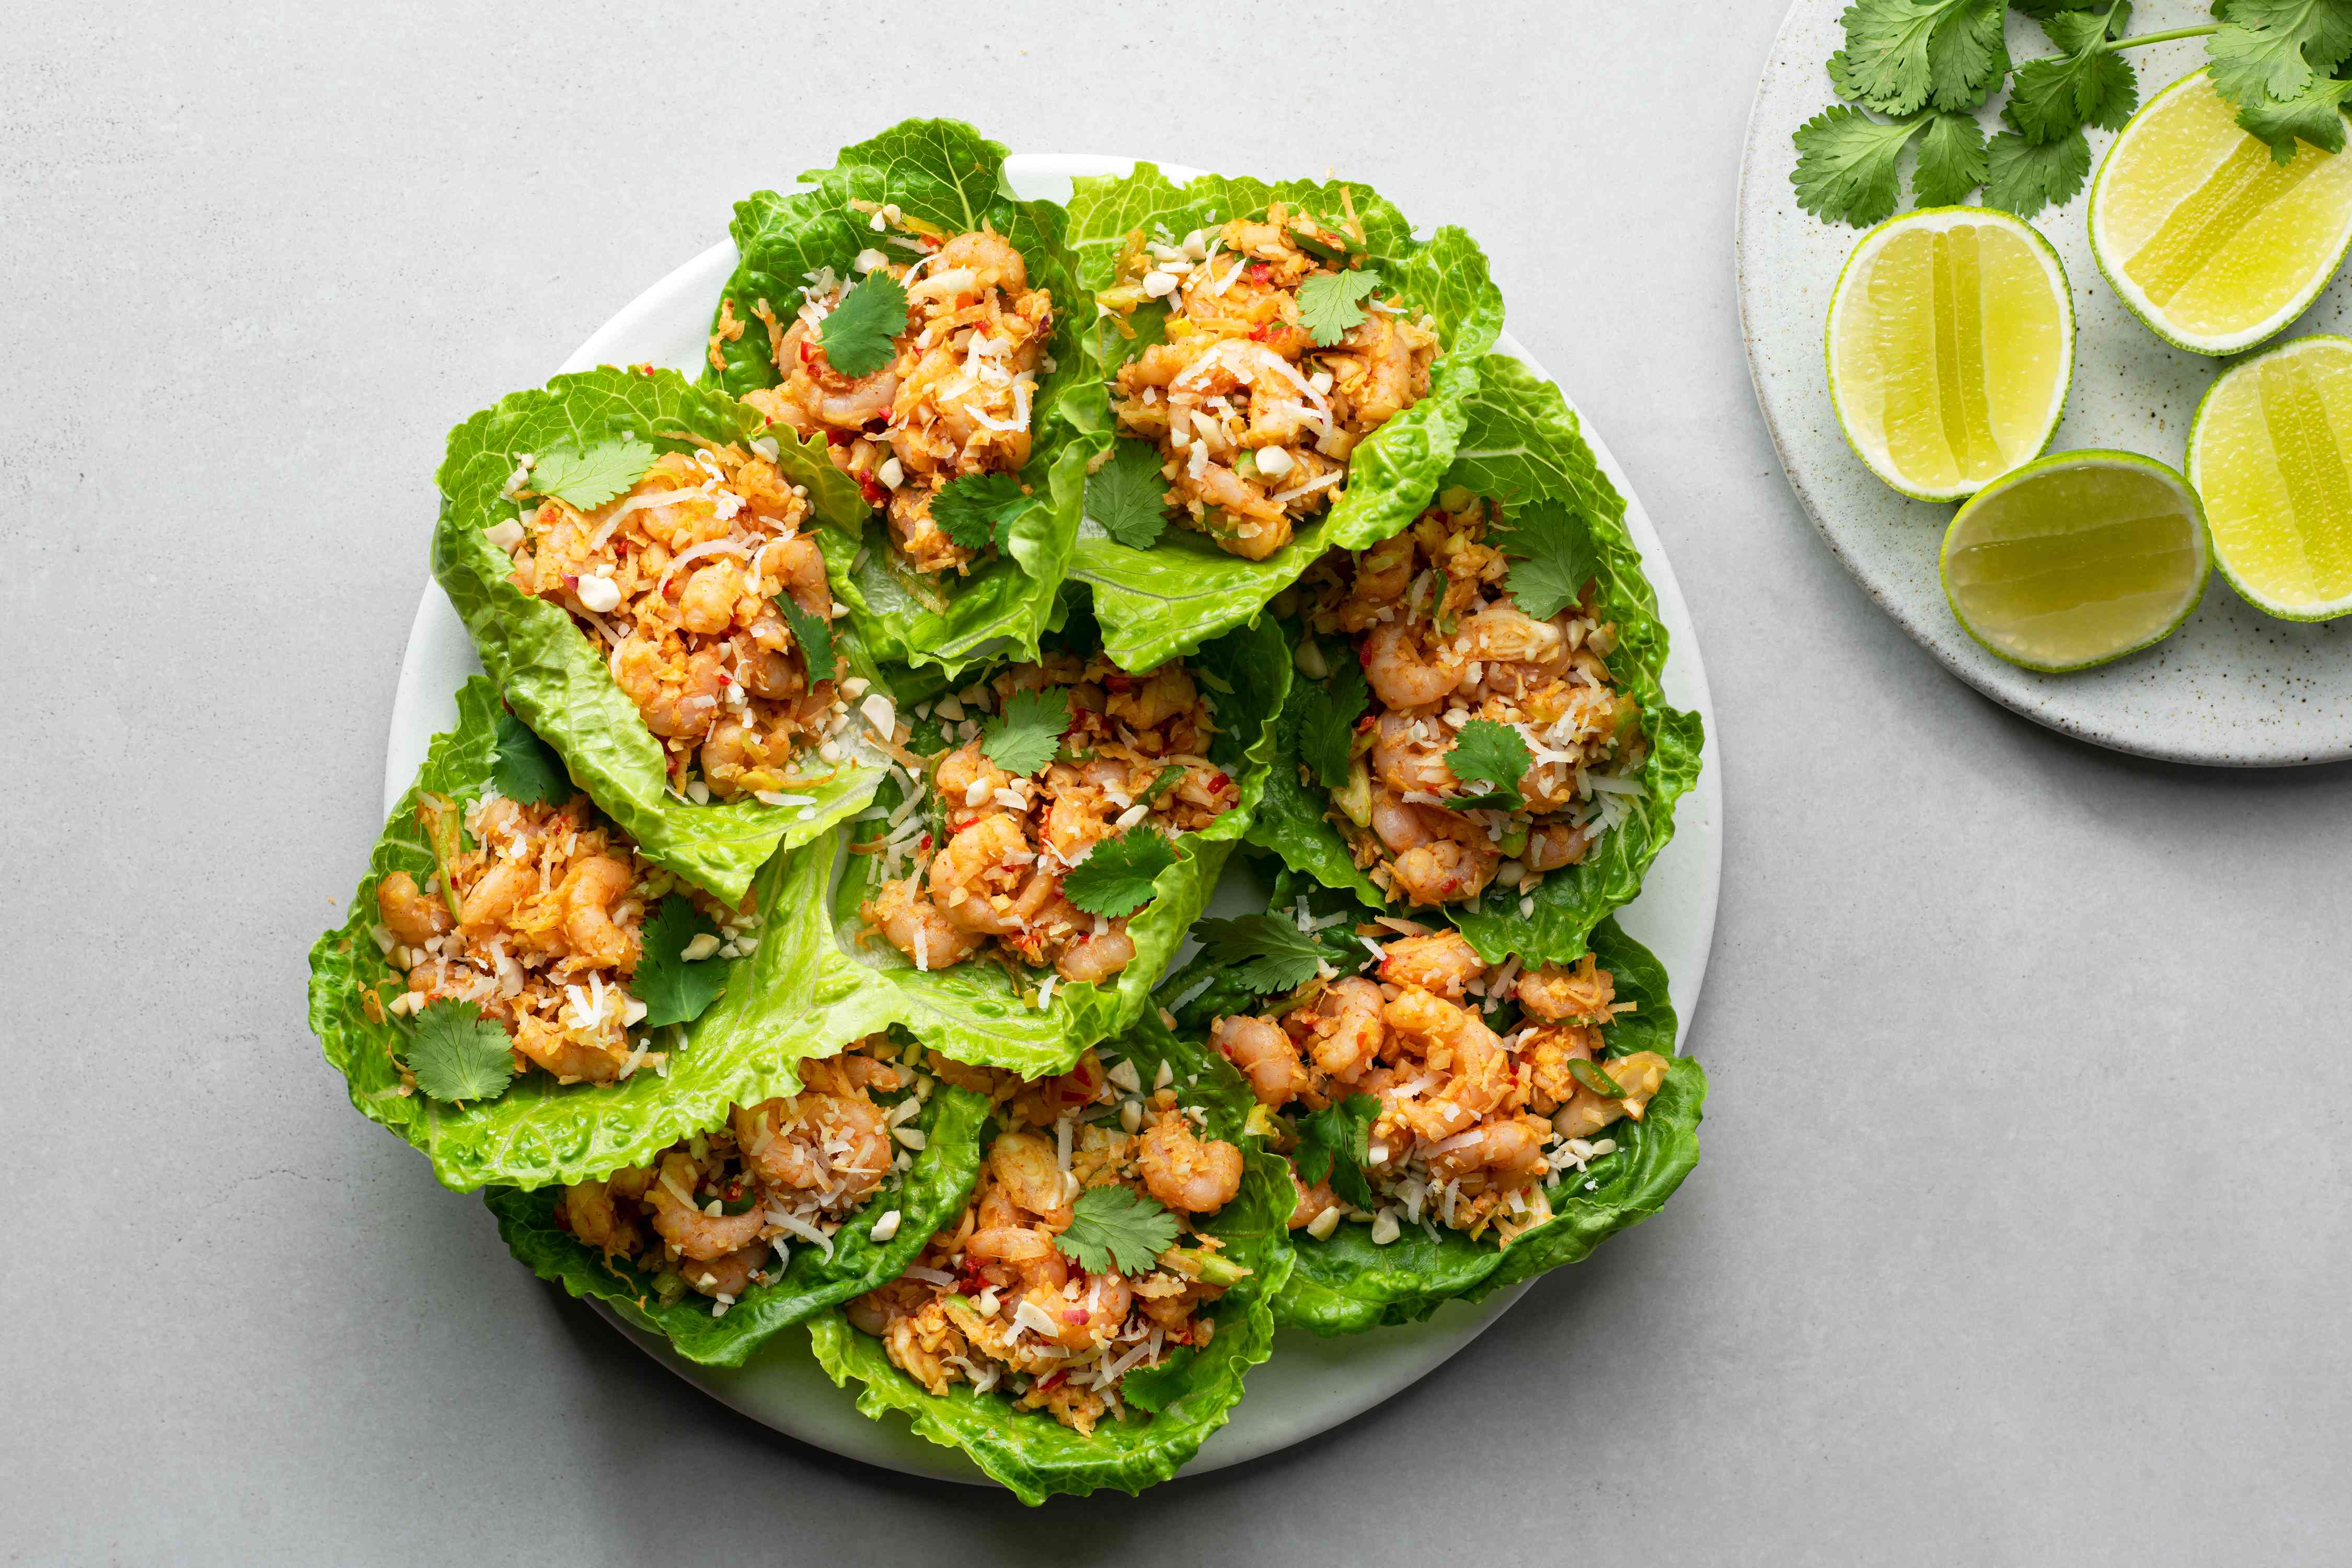 Thai Mini Shrimp Lettuce Wraps with lime on the side